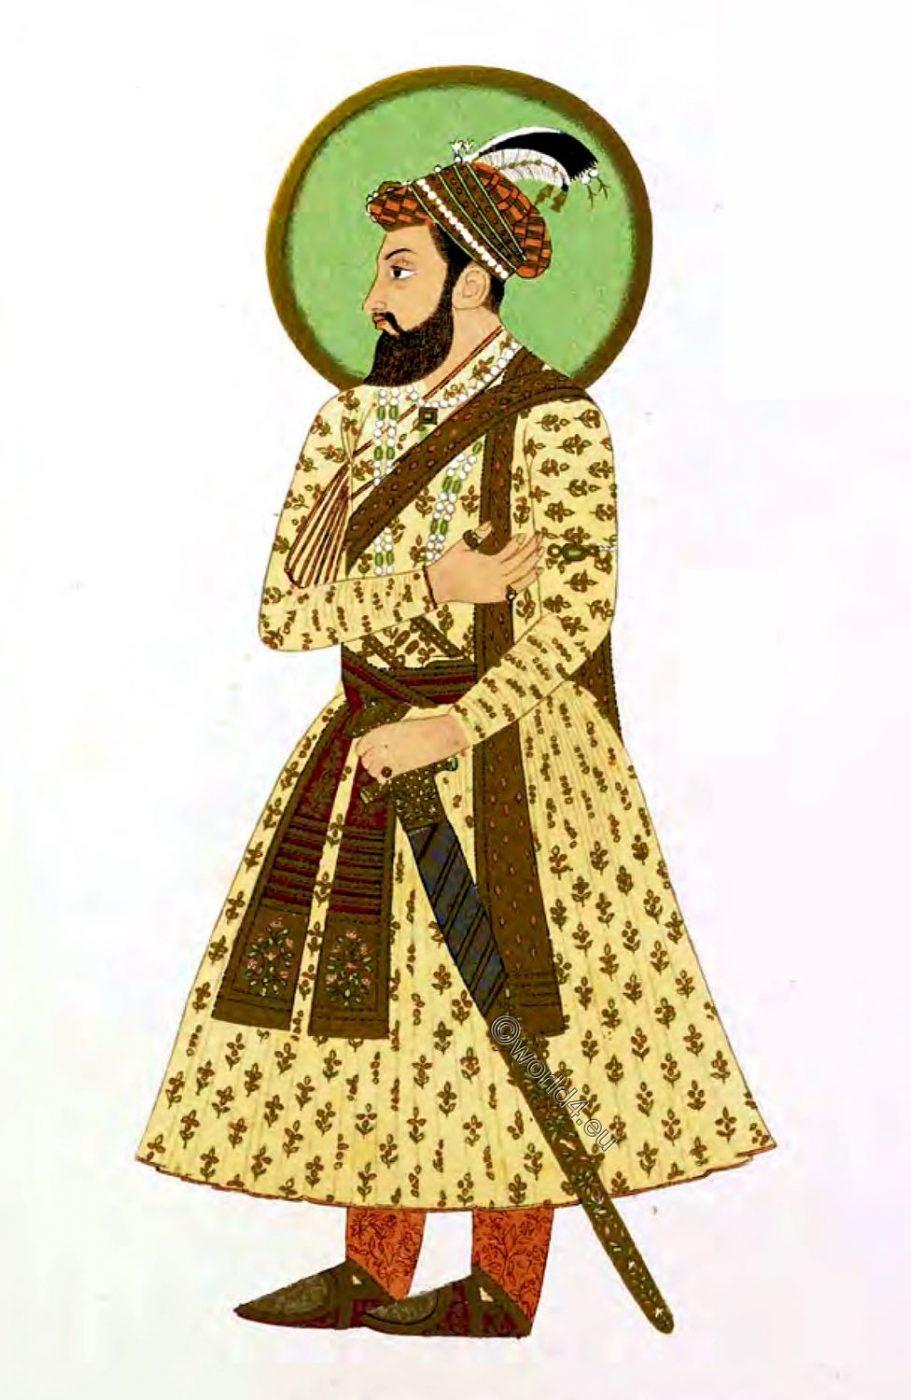 Indian, Moghul, Mirza Khuram, Shah Jahan